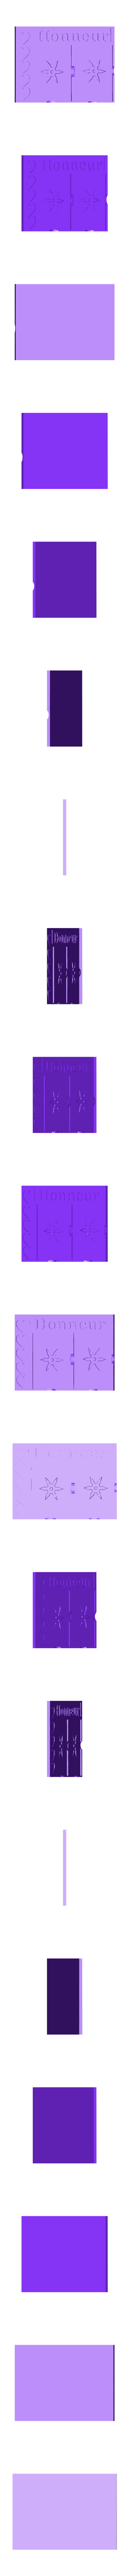 Neat Crift (2).stl Download free STL file Katana game board • 3D printer design, minivanbuzz